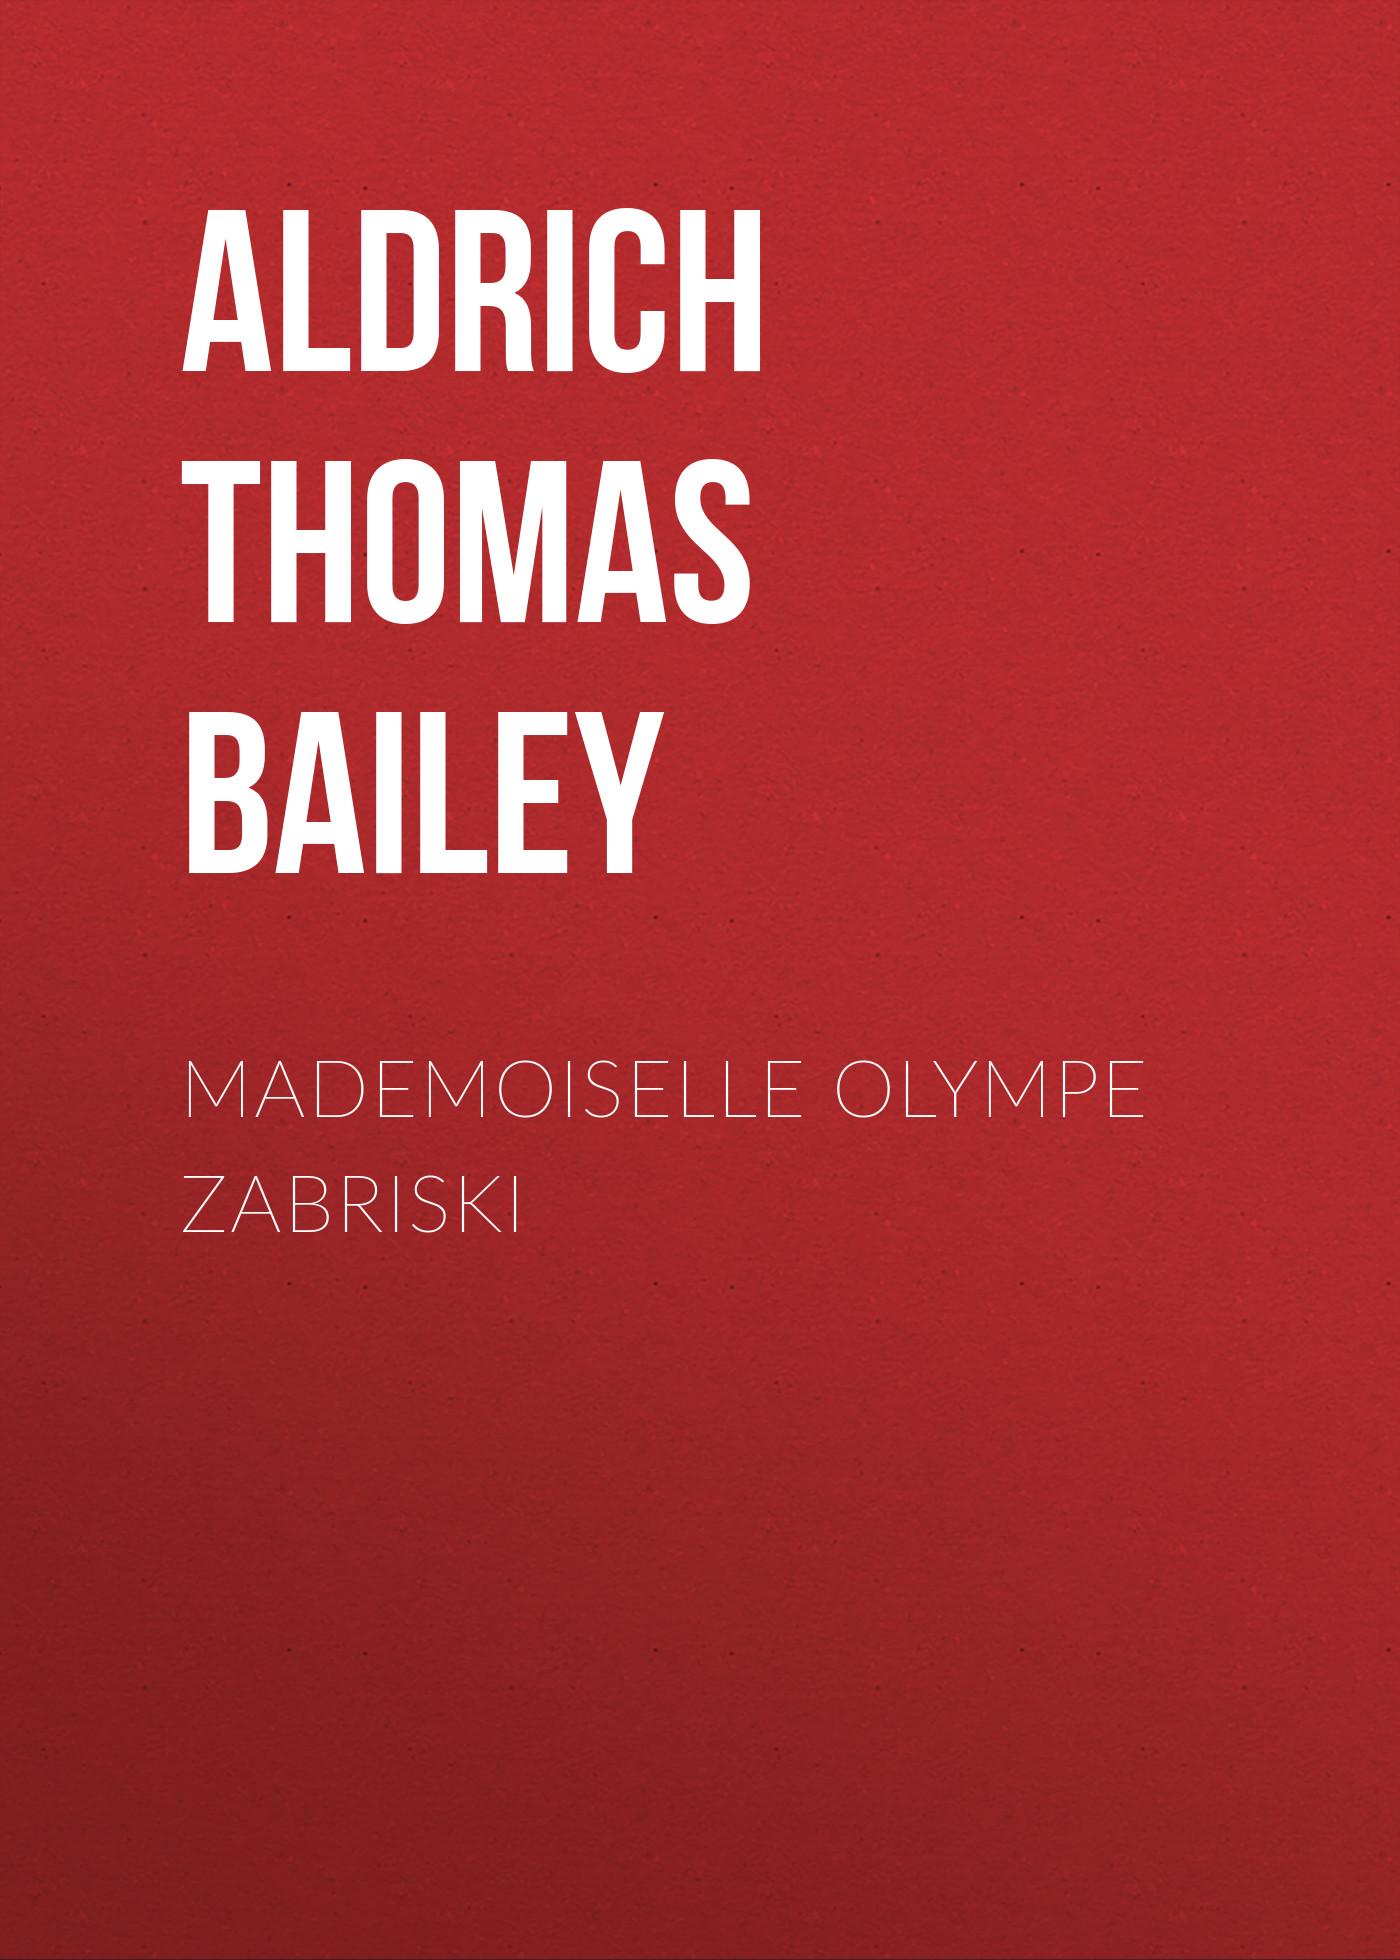 Aldrich Thomas Bailey Mademoiselle Olympe Zabriski aldrich thomas bailey wyndham towers